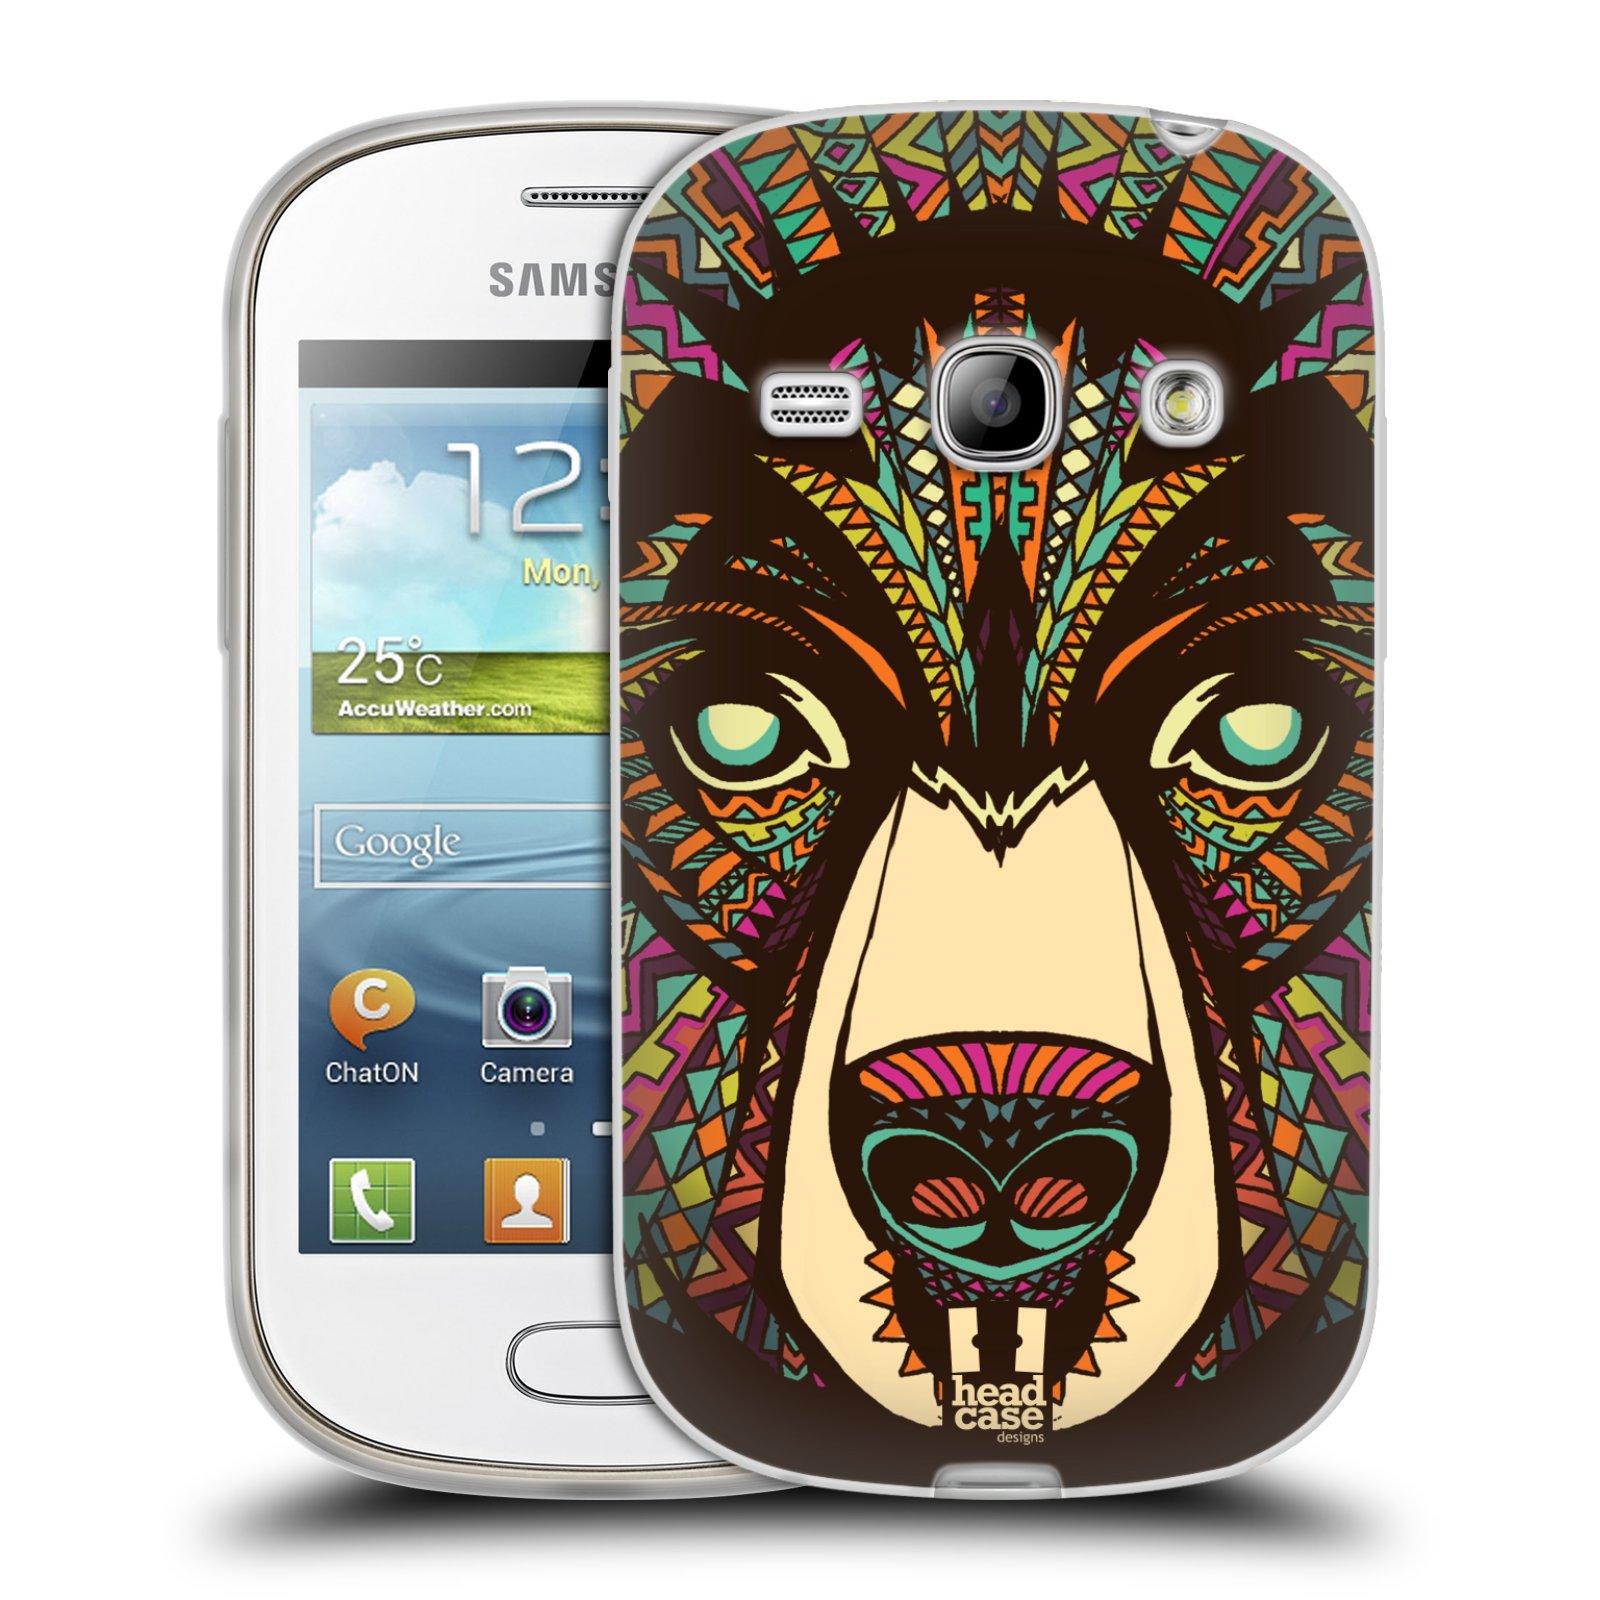 Silikonové pouzdro na mobil Samsung Galaxy Fame HEAD CASE AZTEC MEDVĚD (Silikonový kryt či obal na mobilní telefon Samsung Galaxy Fame GT-S6810)